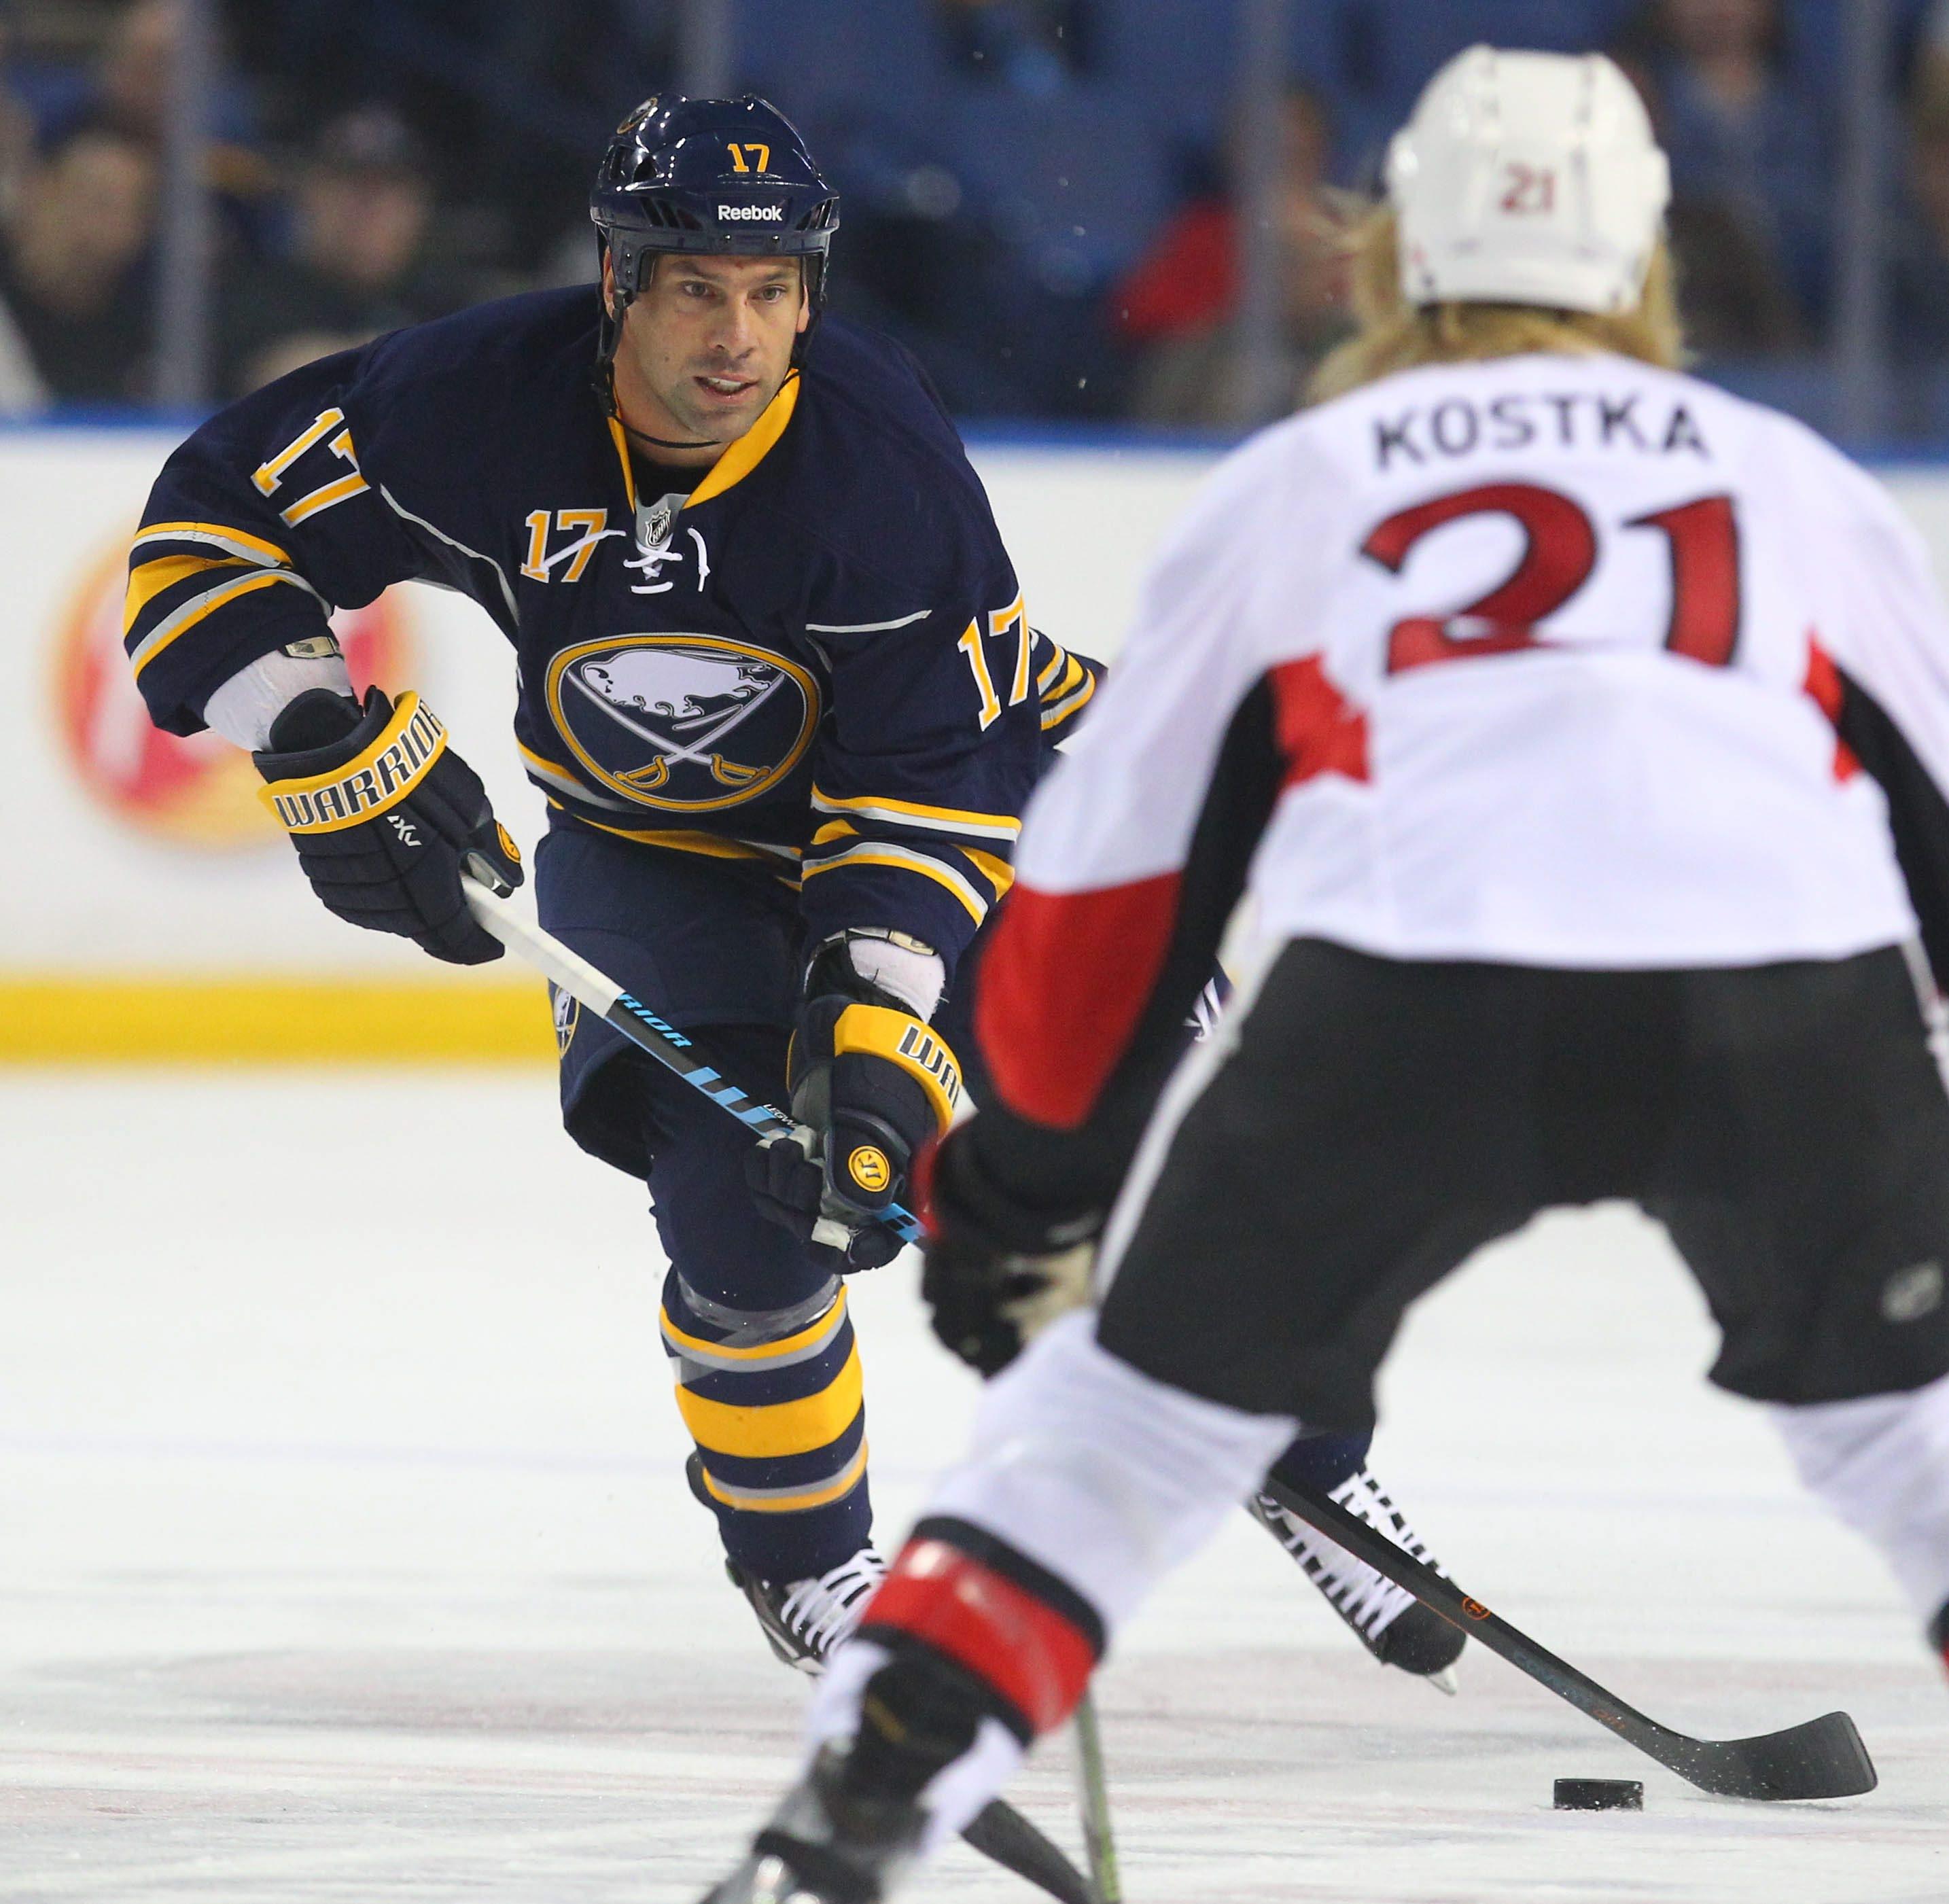 Sabres veteran forward David Legwand loves imparting hockey wisdom to his younger teammates such as Jack Eichel and Sam Reinhart.